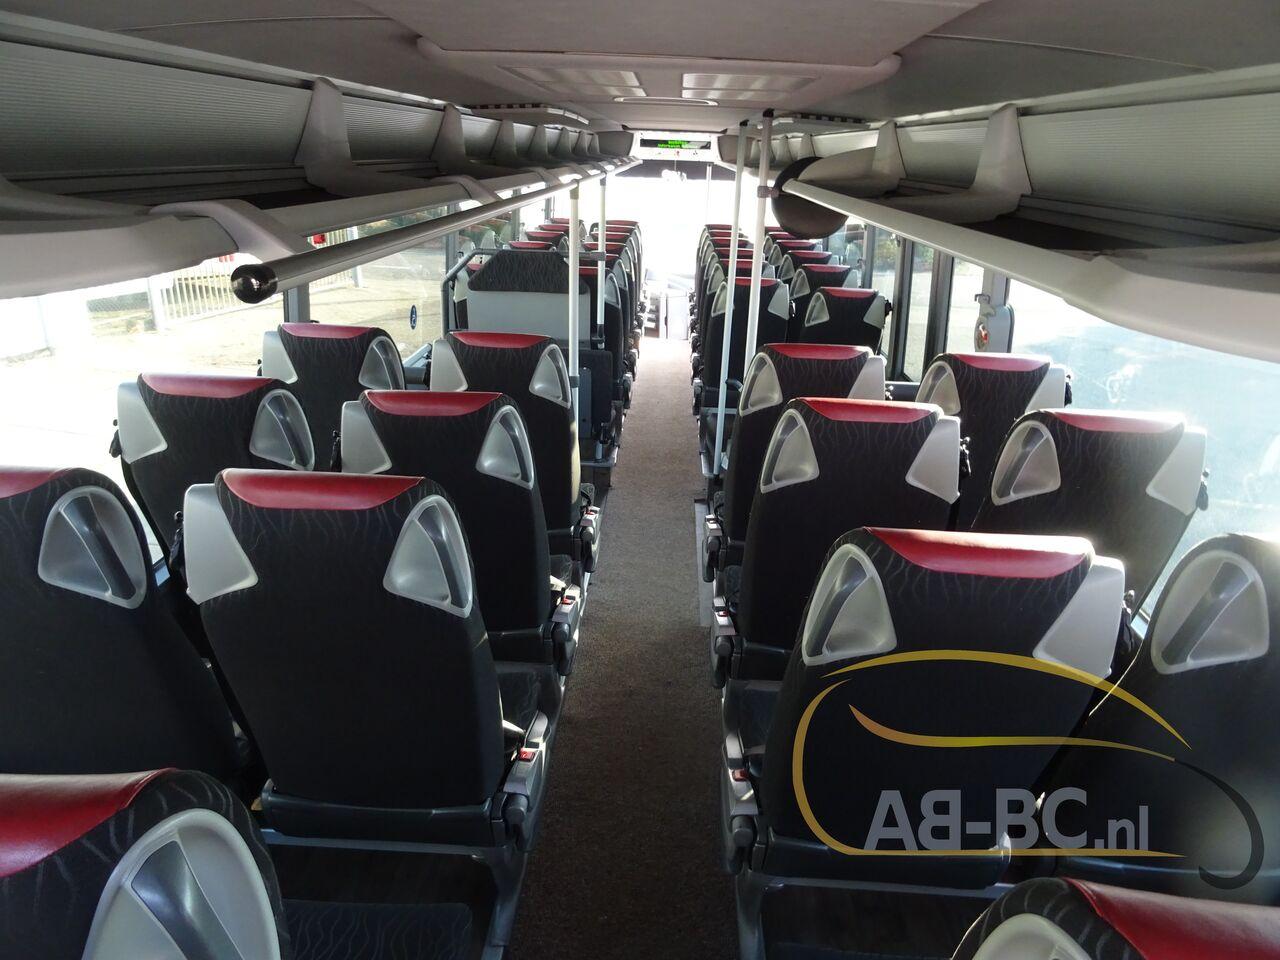 coach-bus-SETRA-S415H-52-Seats-EURO-6-Liftbus---1630913485685615557_big_b8fcd3613326050240170e6cfb427a83--21070517141280735500